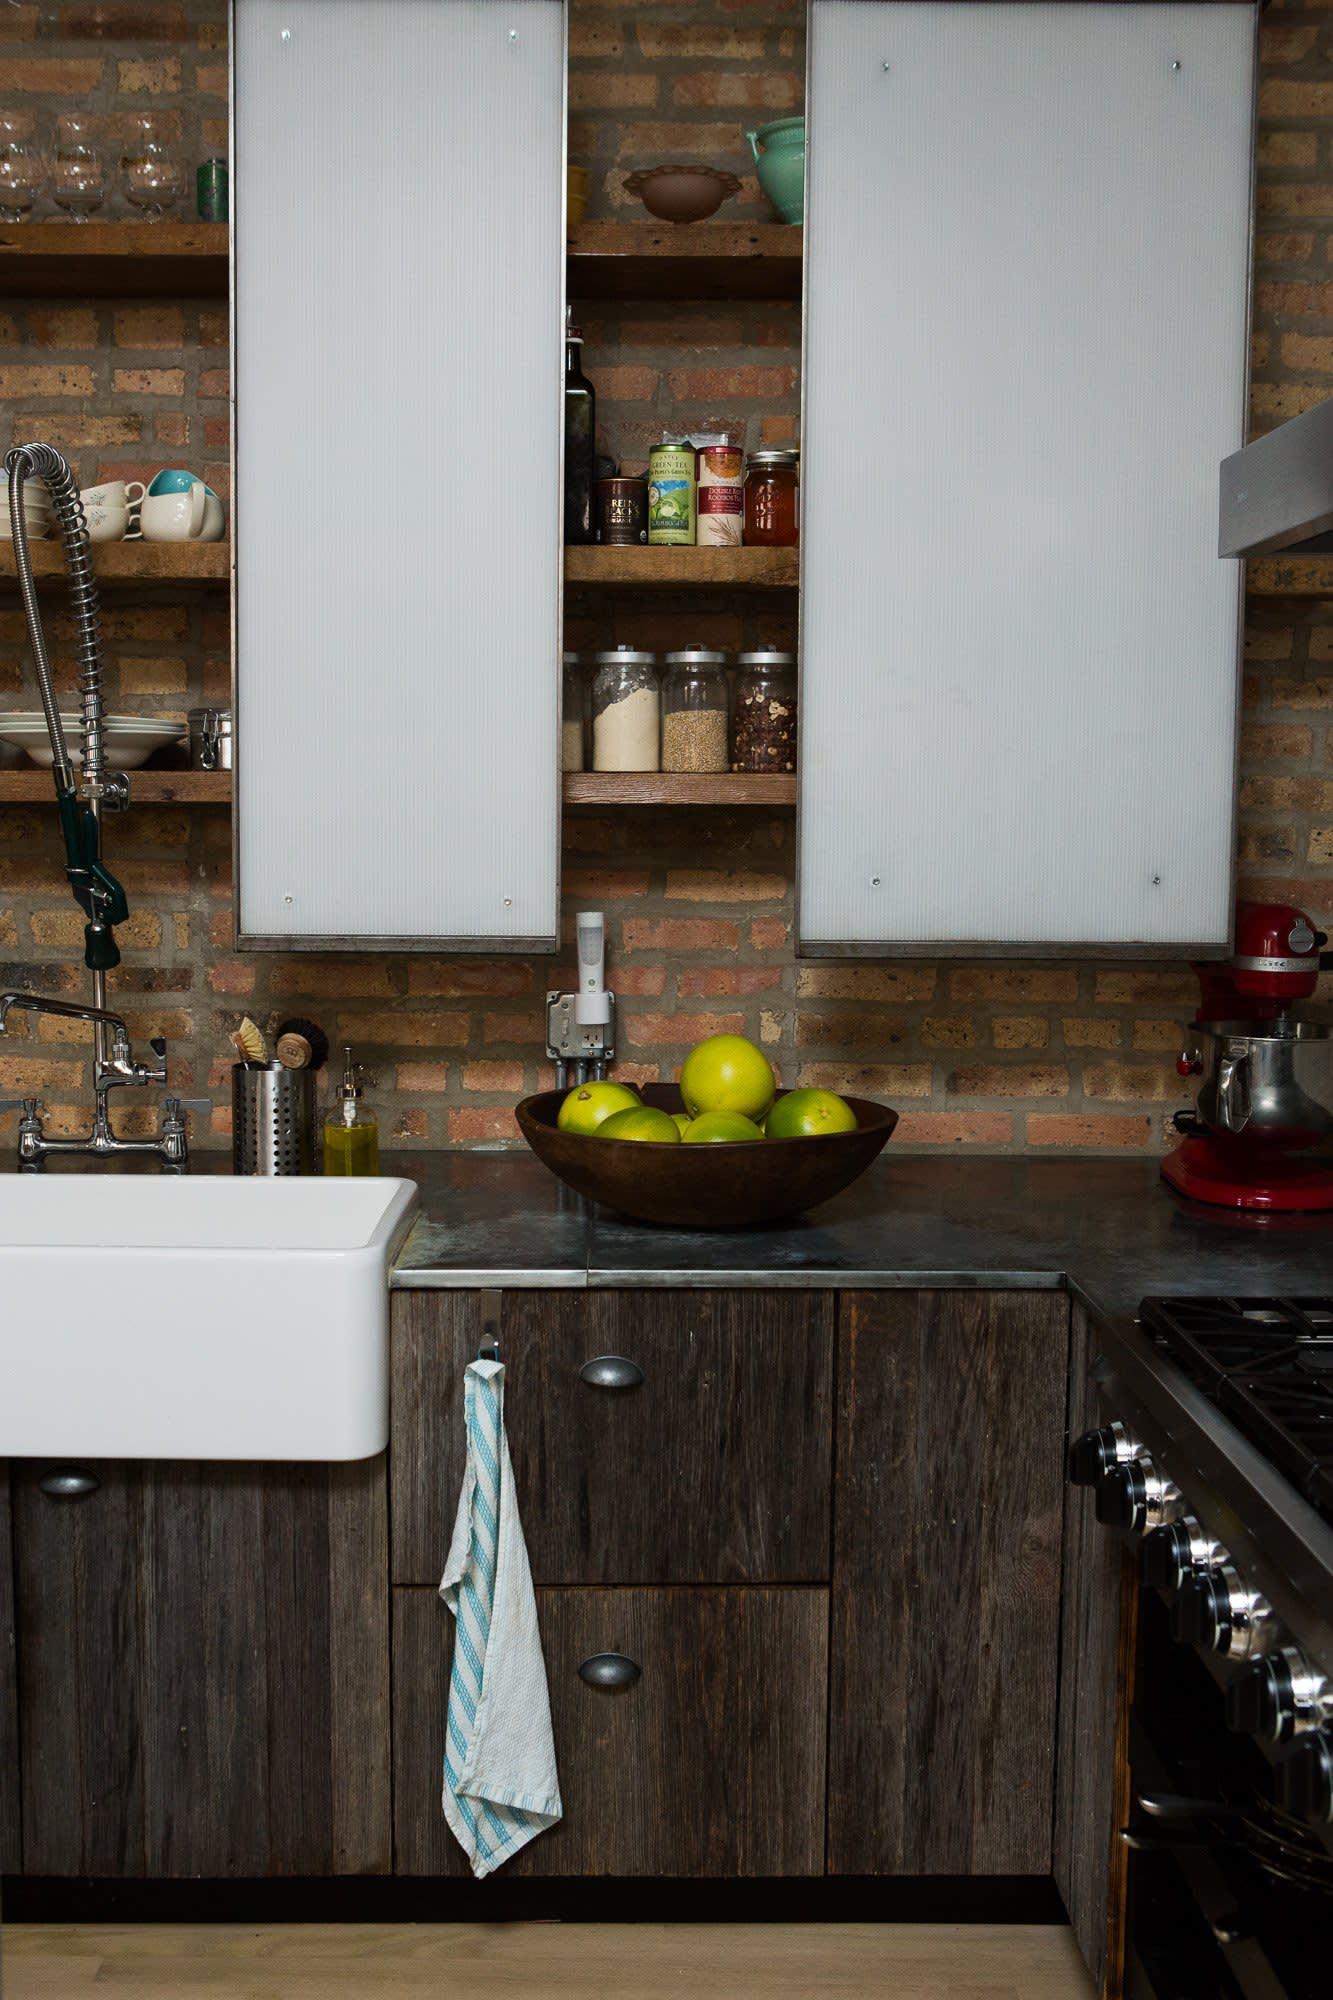 Ellen & Greg's Renovated Loft Kitchen: gallery image 10